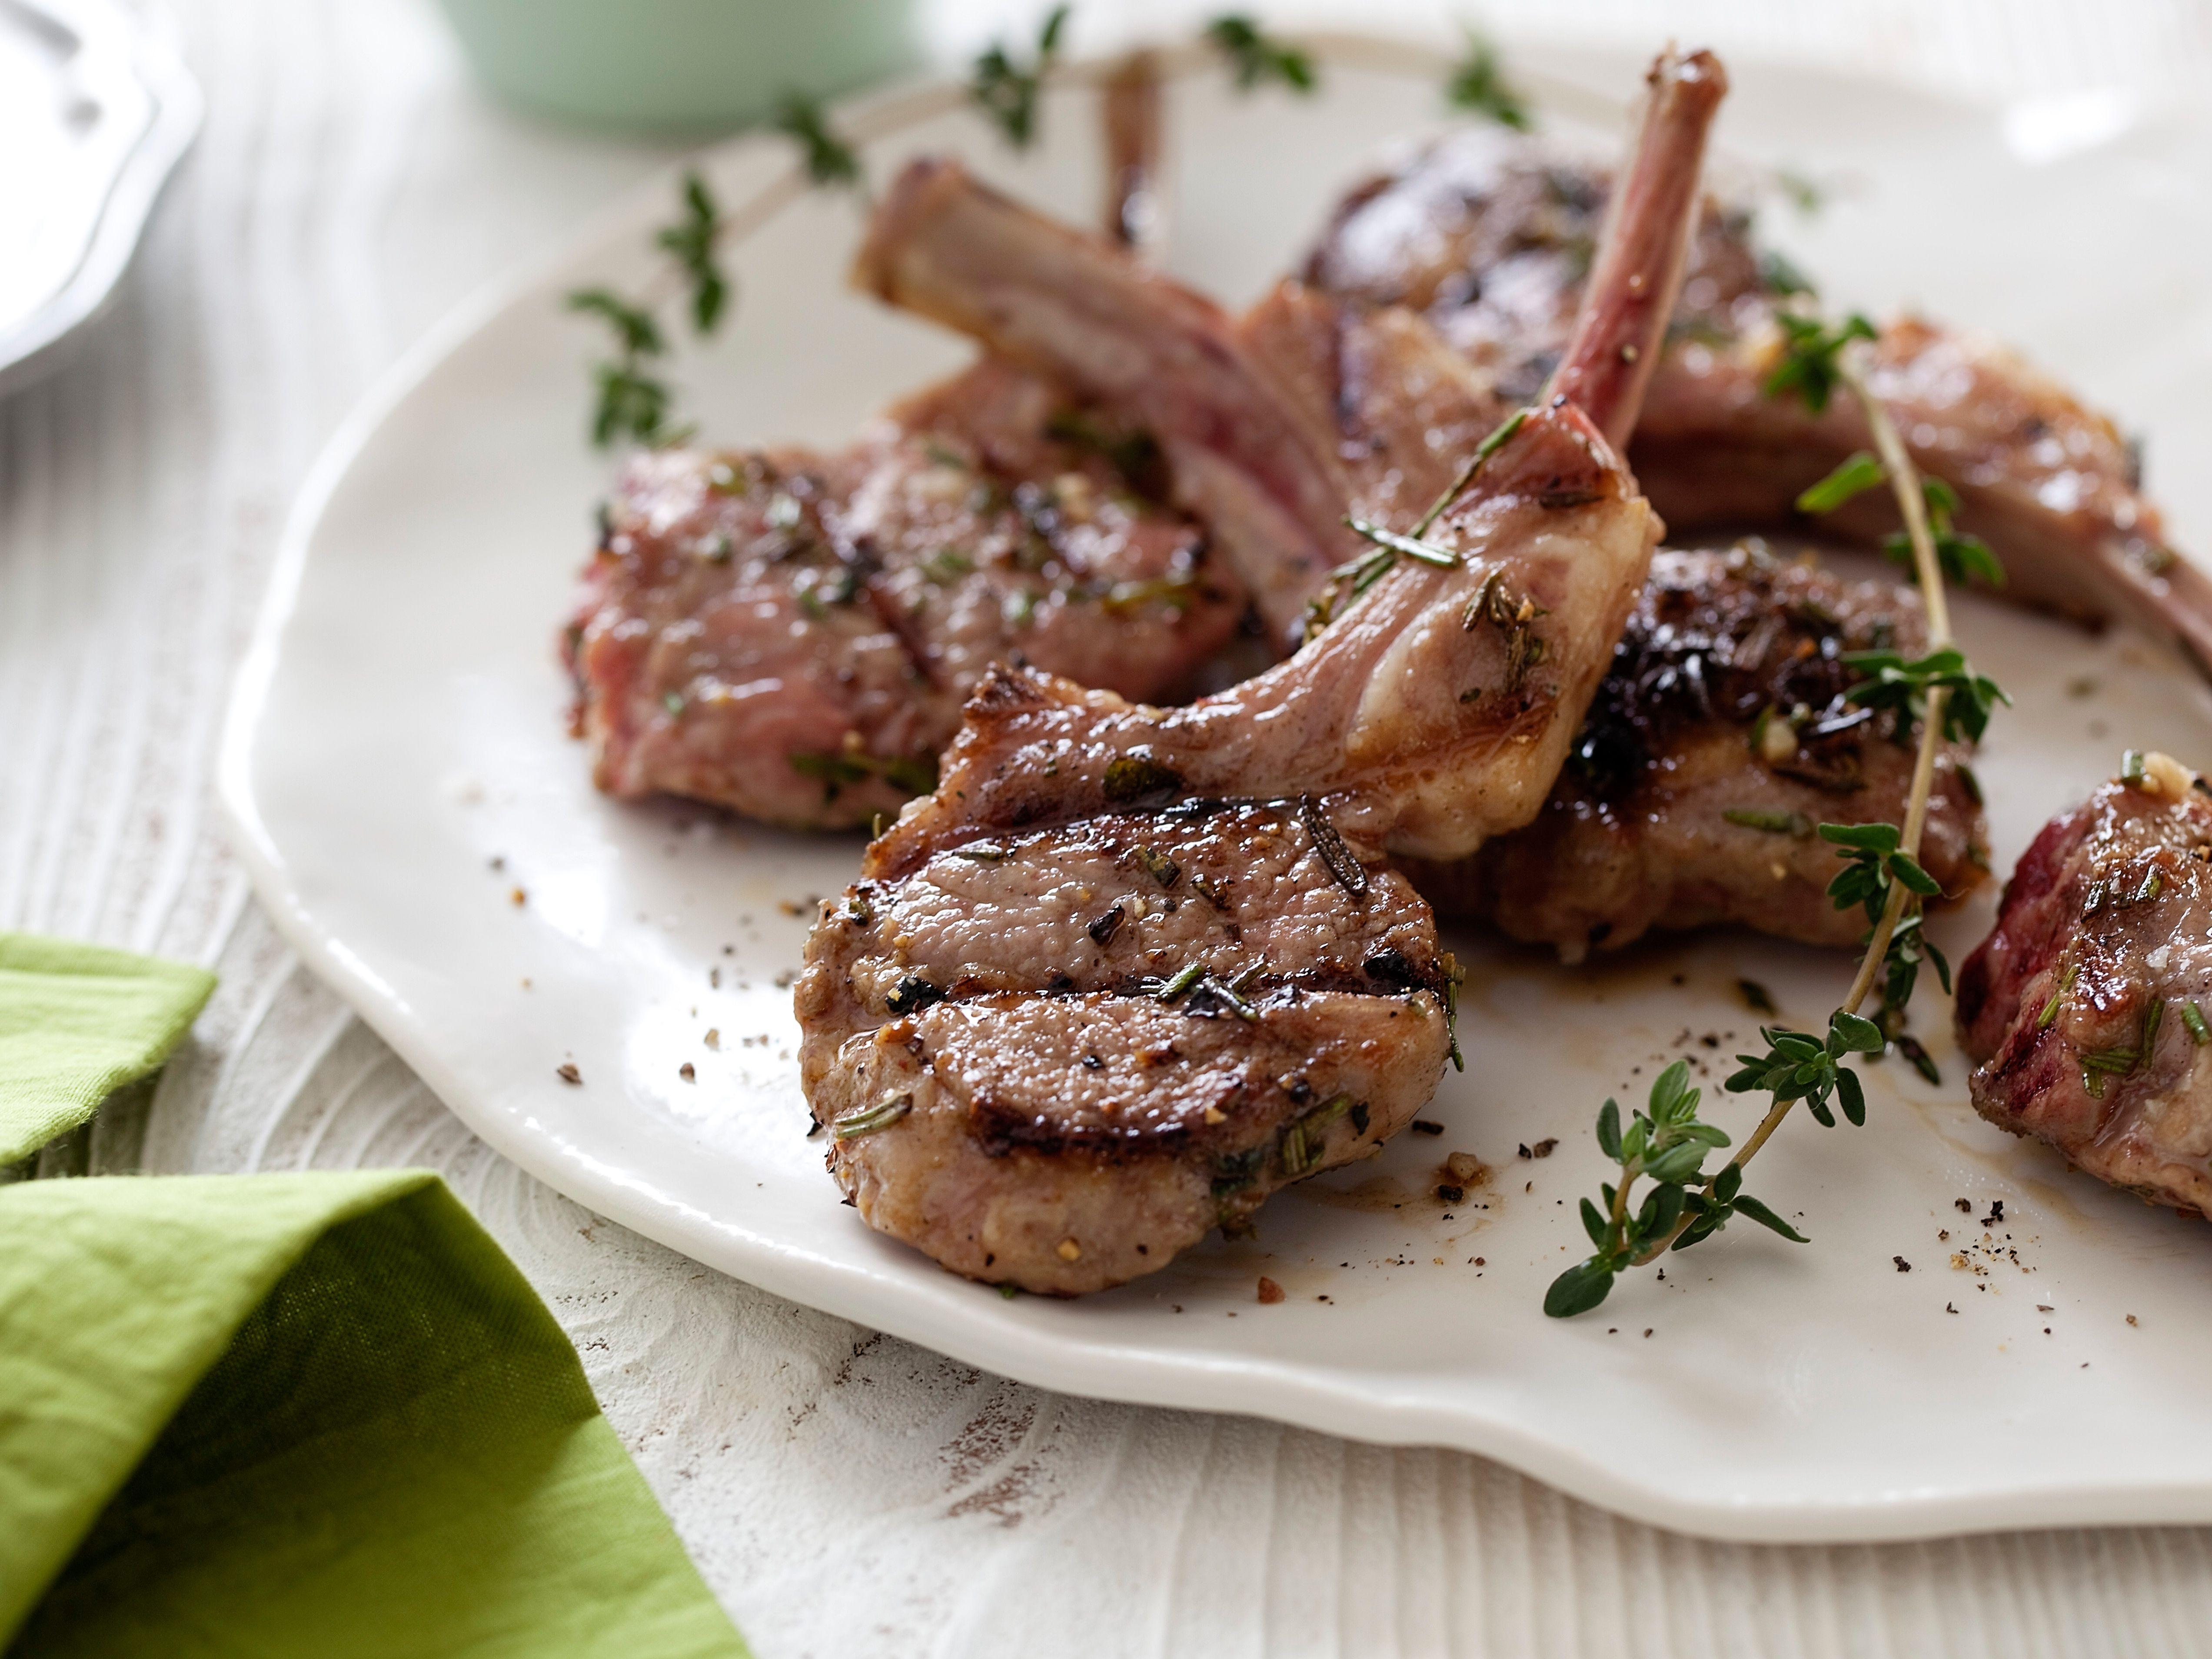 Grilled Lamb Chops Recipe : Giada De Laurentiis : Food Network - FoodNetwork.com- This dish was fantastic!